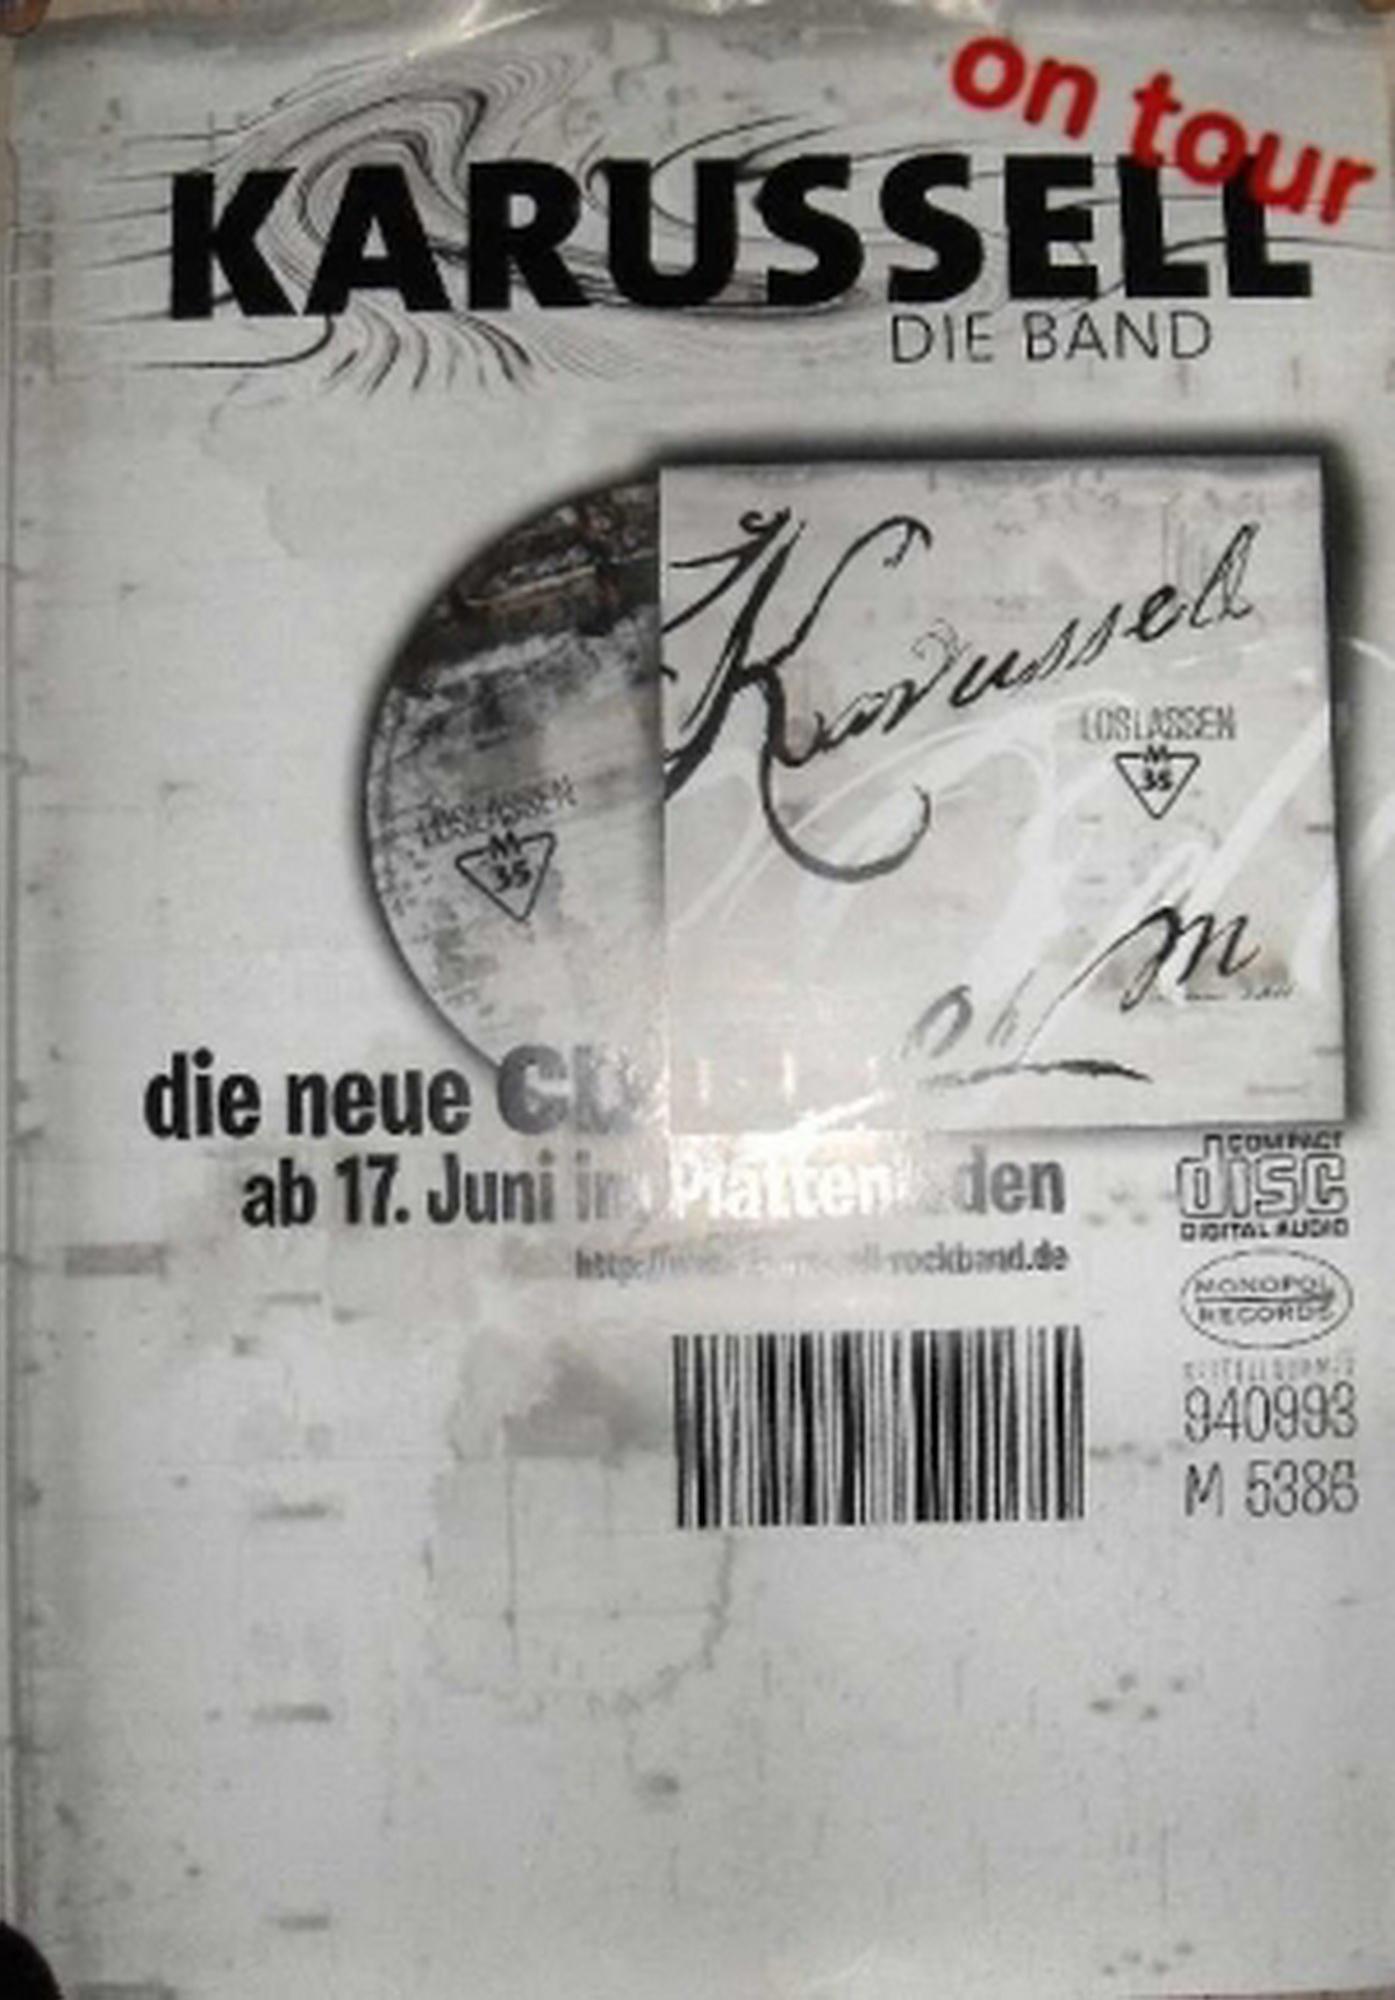 2011.06.17_CD_loslassen